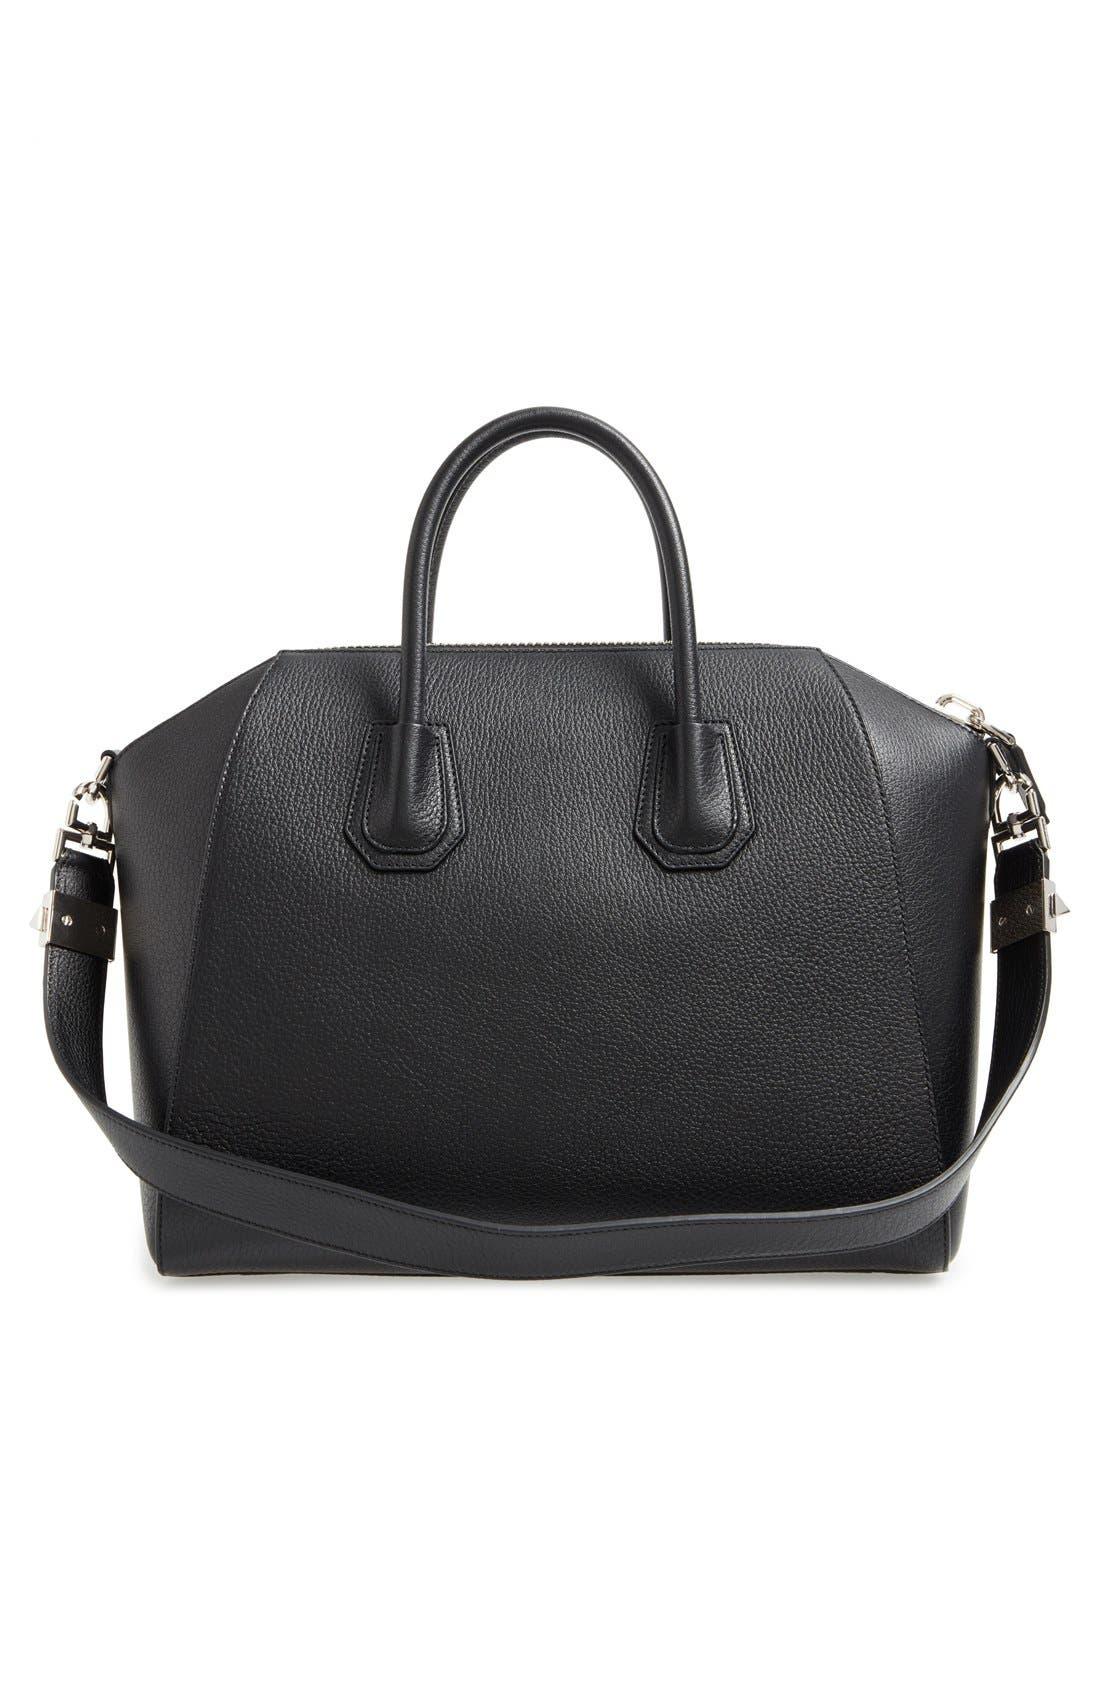 Alternate Image 3  - Givenchy 'Medium Antigona' Sugar Leather Satchel